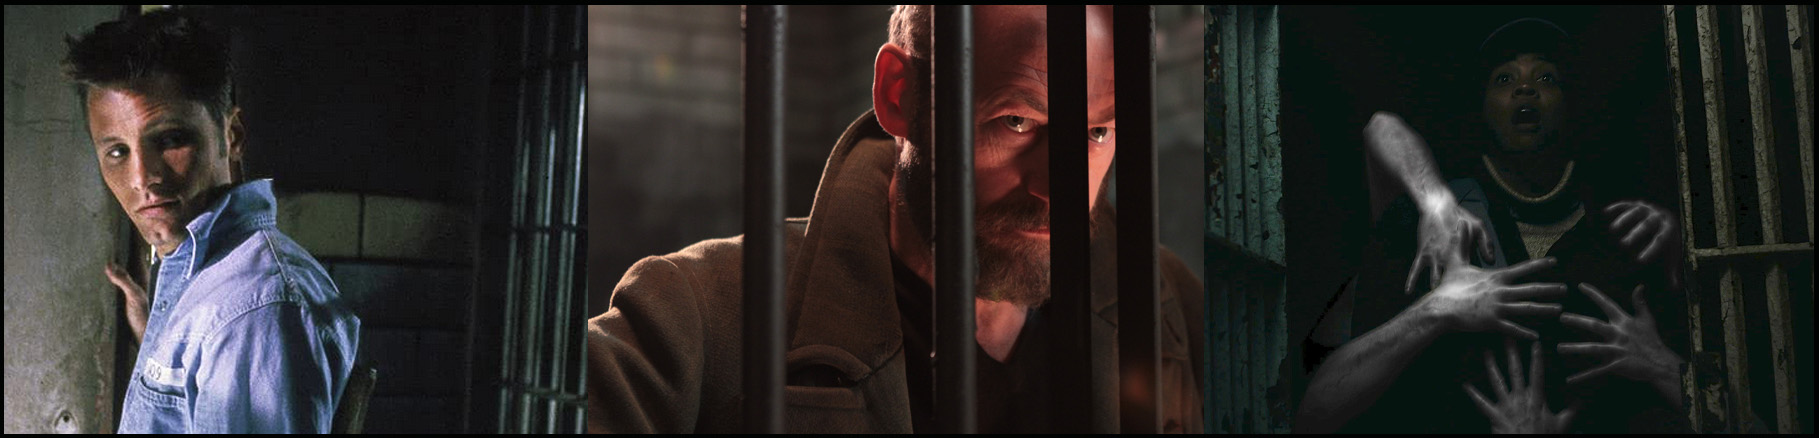 Gefängnishorrorfilm